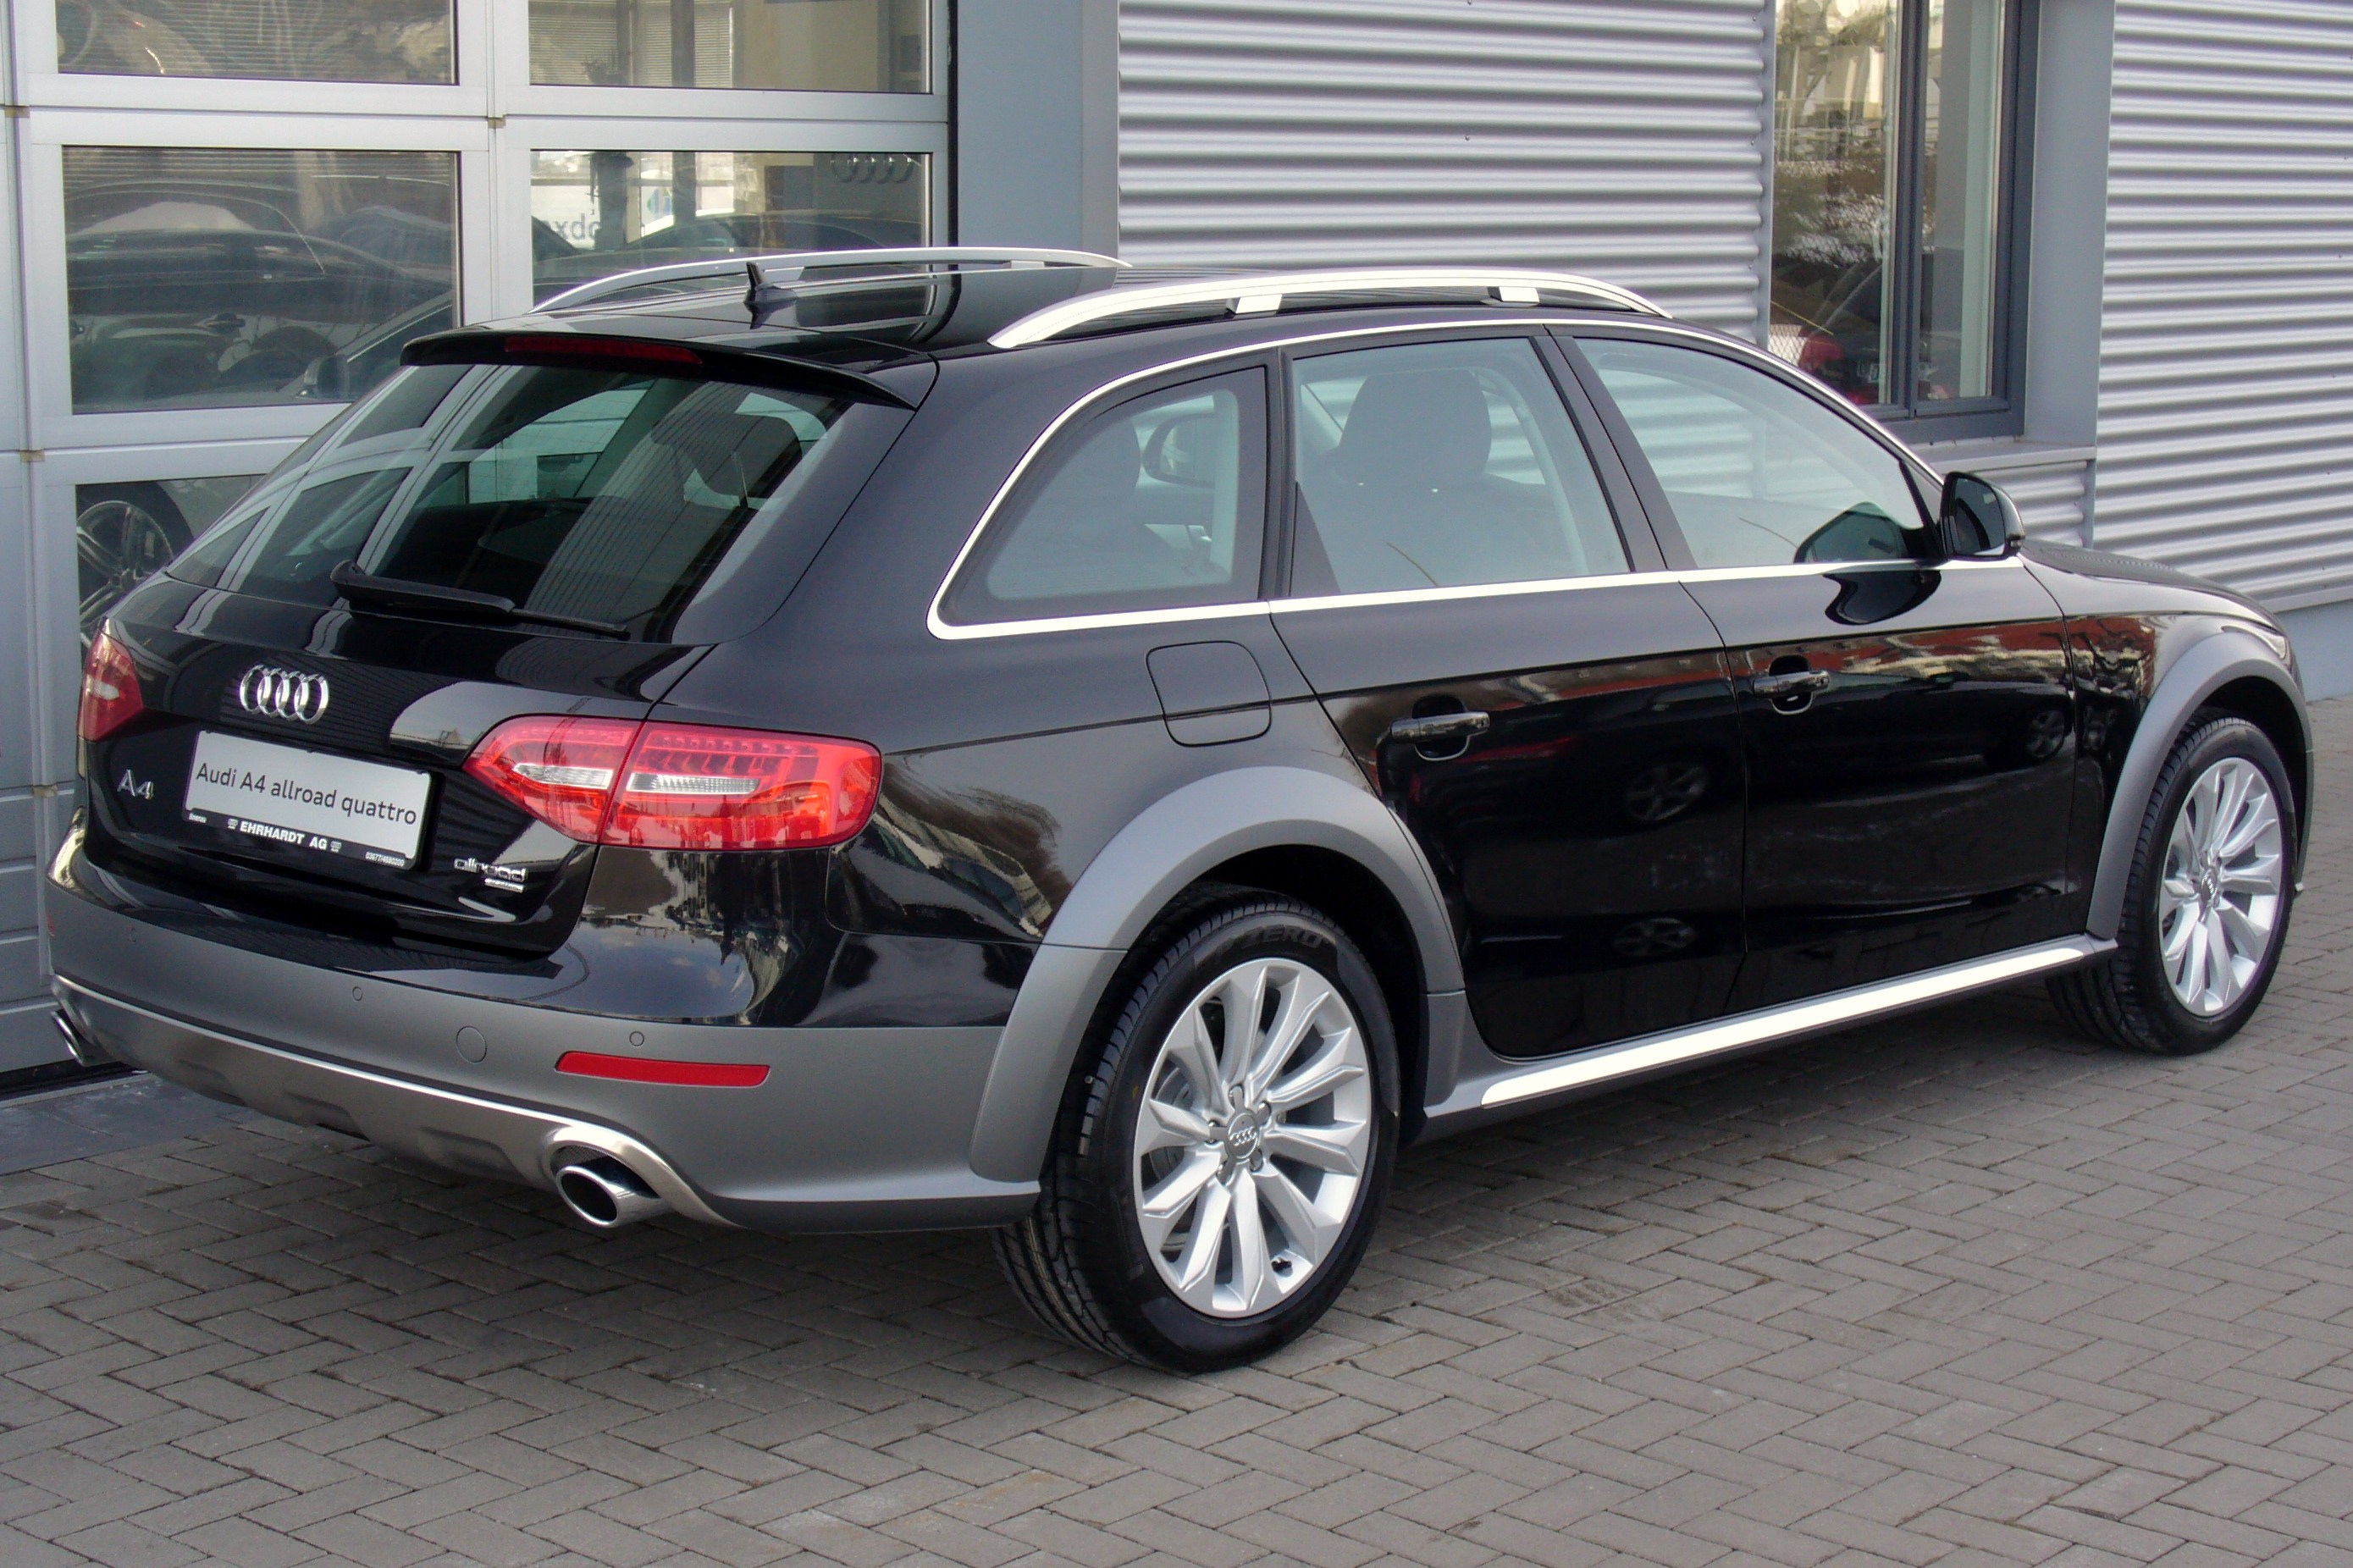 шины и диски для Audi A4 Allroad 2011 30 Tdi Quattro размер колёс